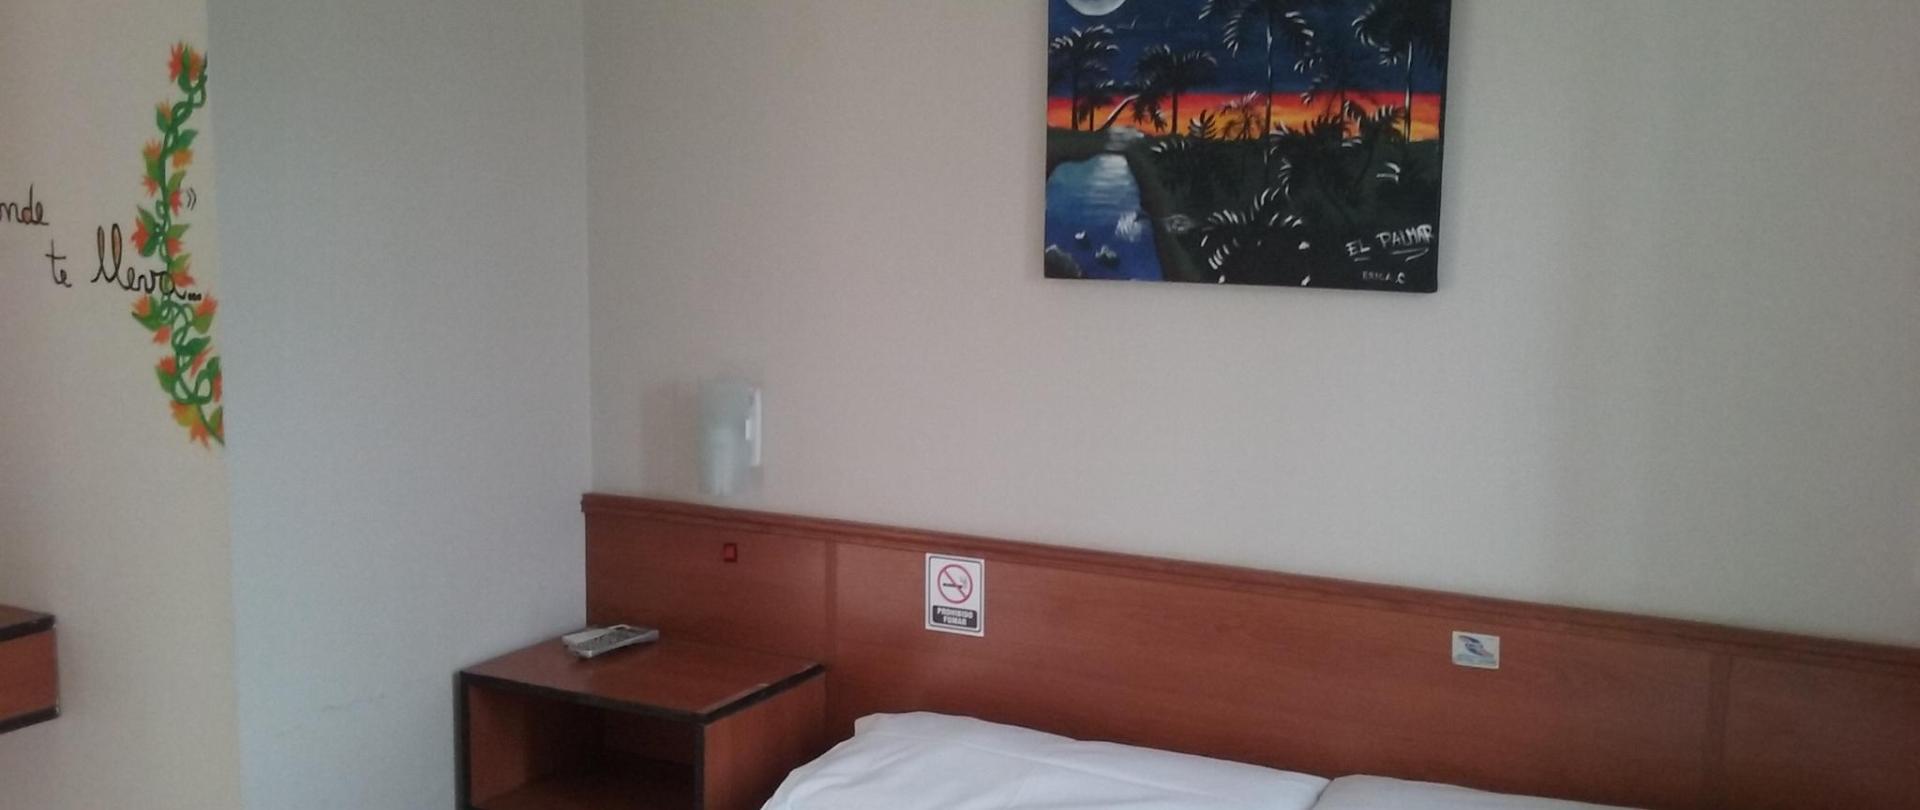 DBL Sup Hotel Queguay.jpg